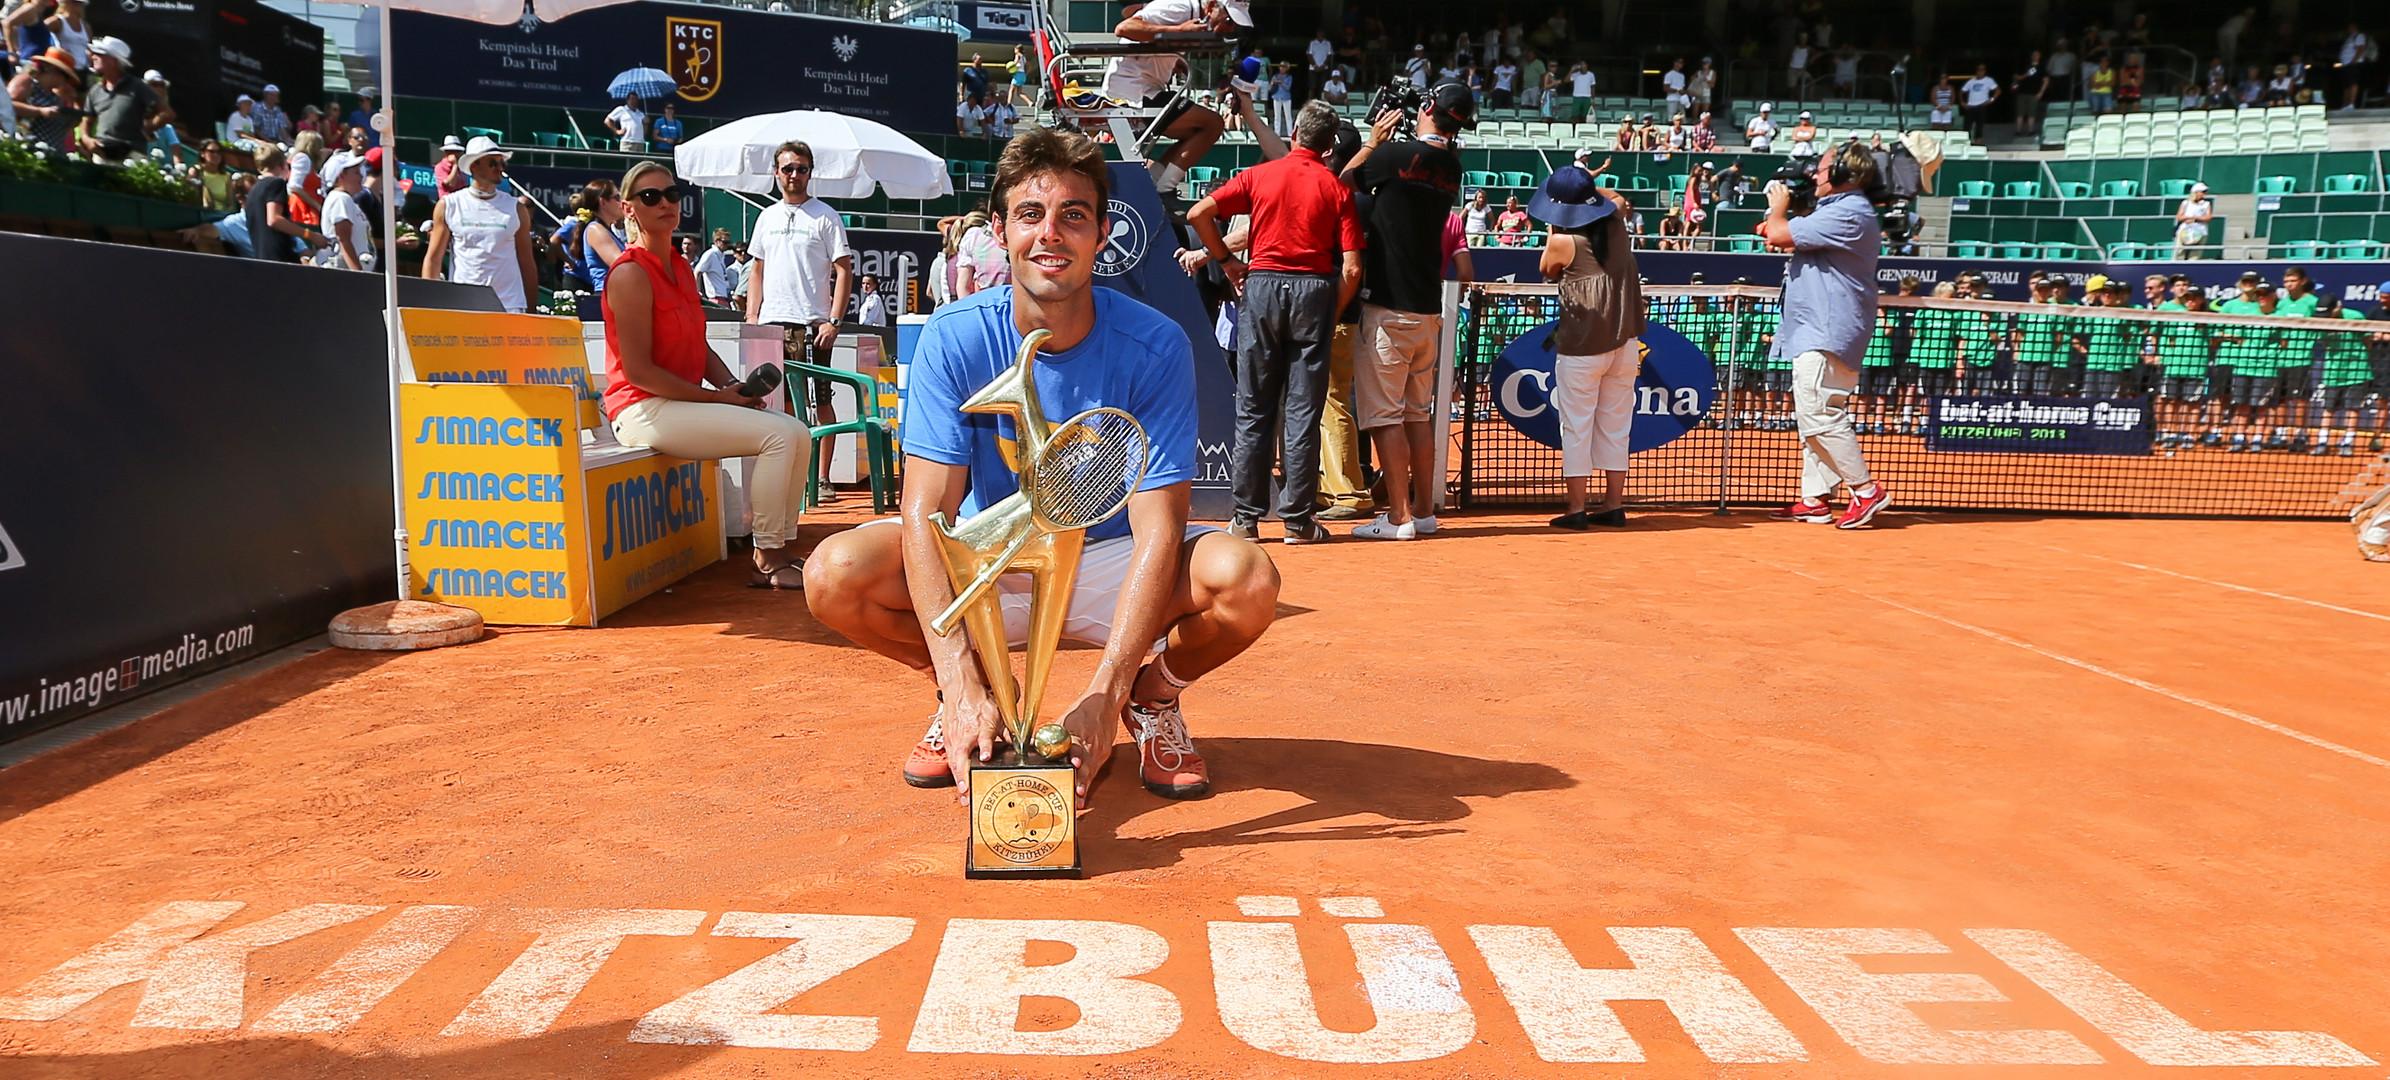 Turniersieg Kitzbühel 2013